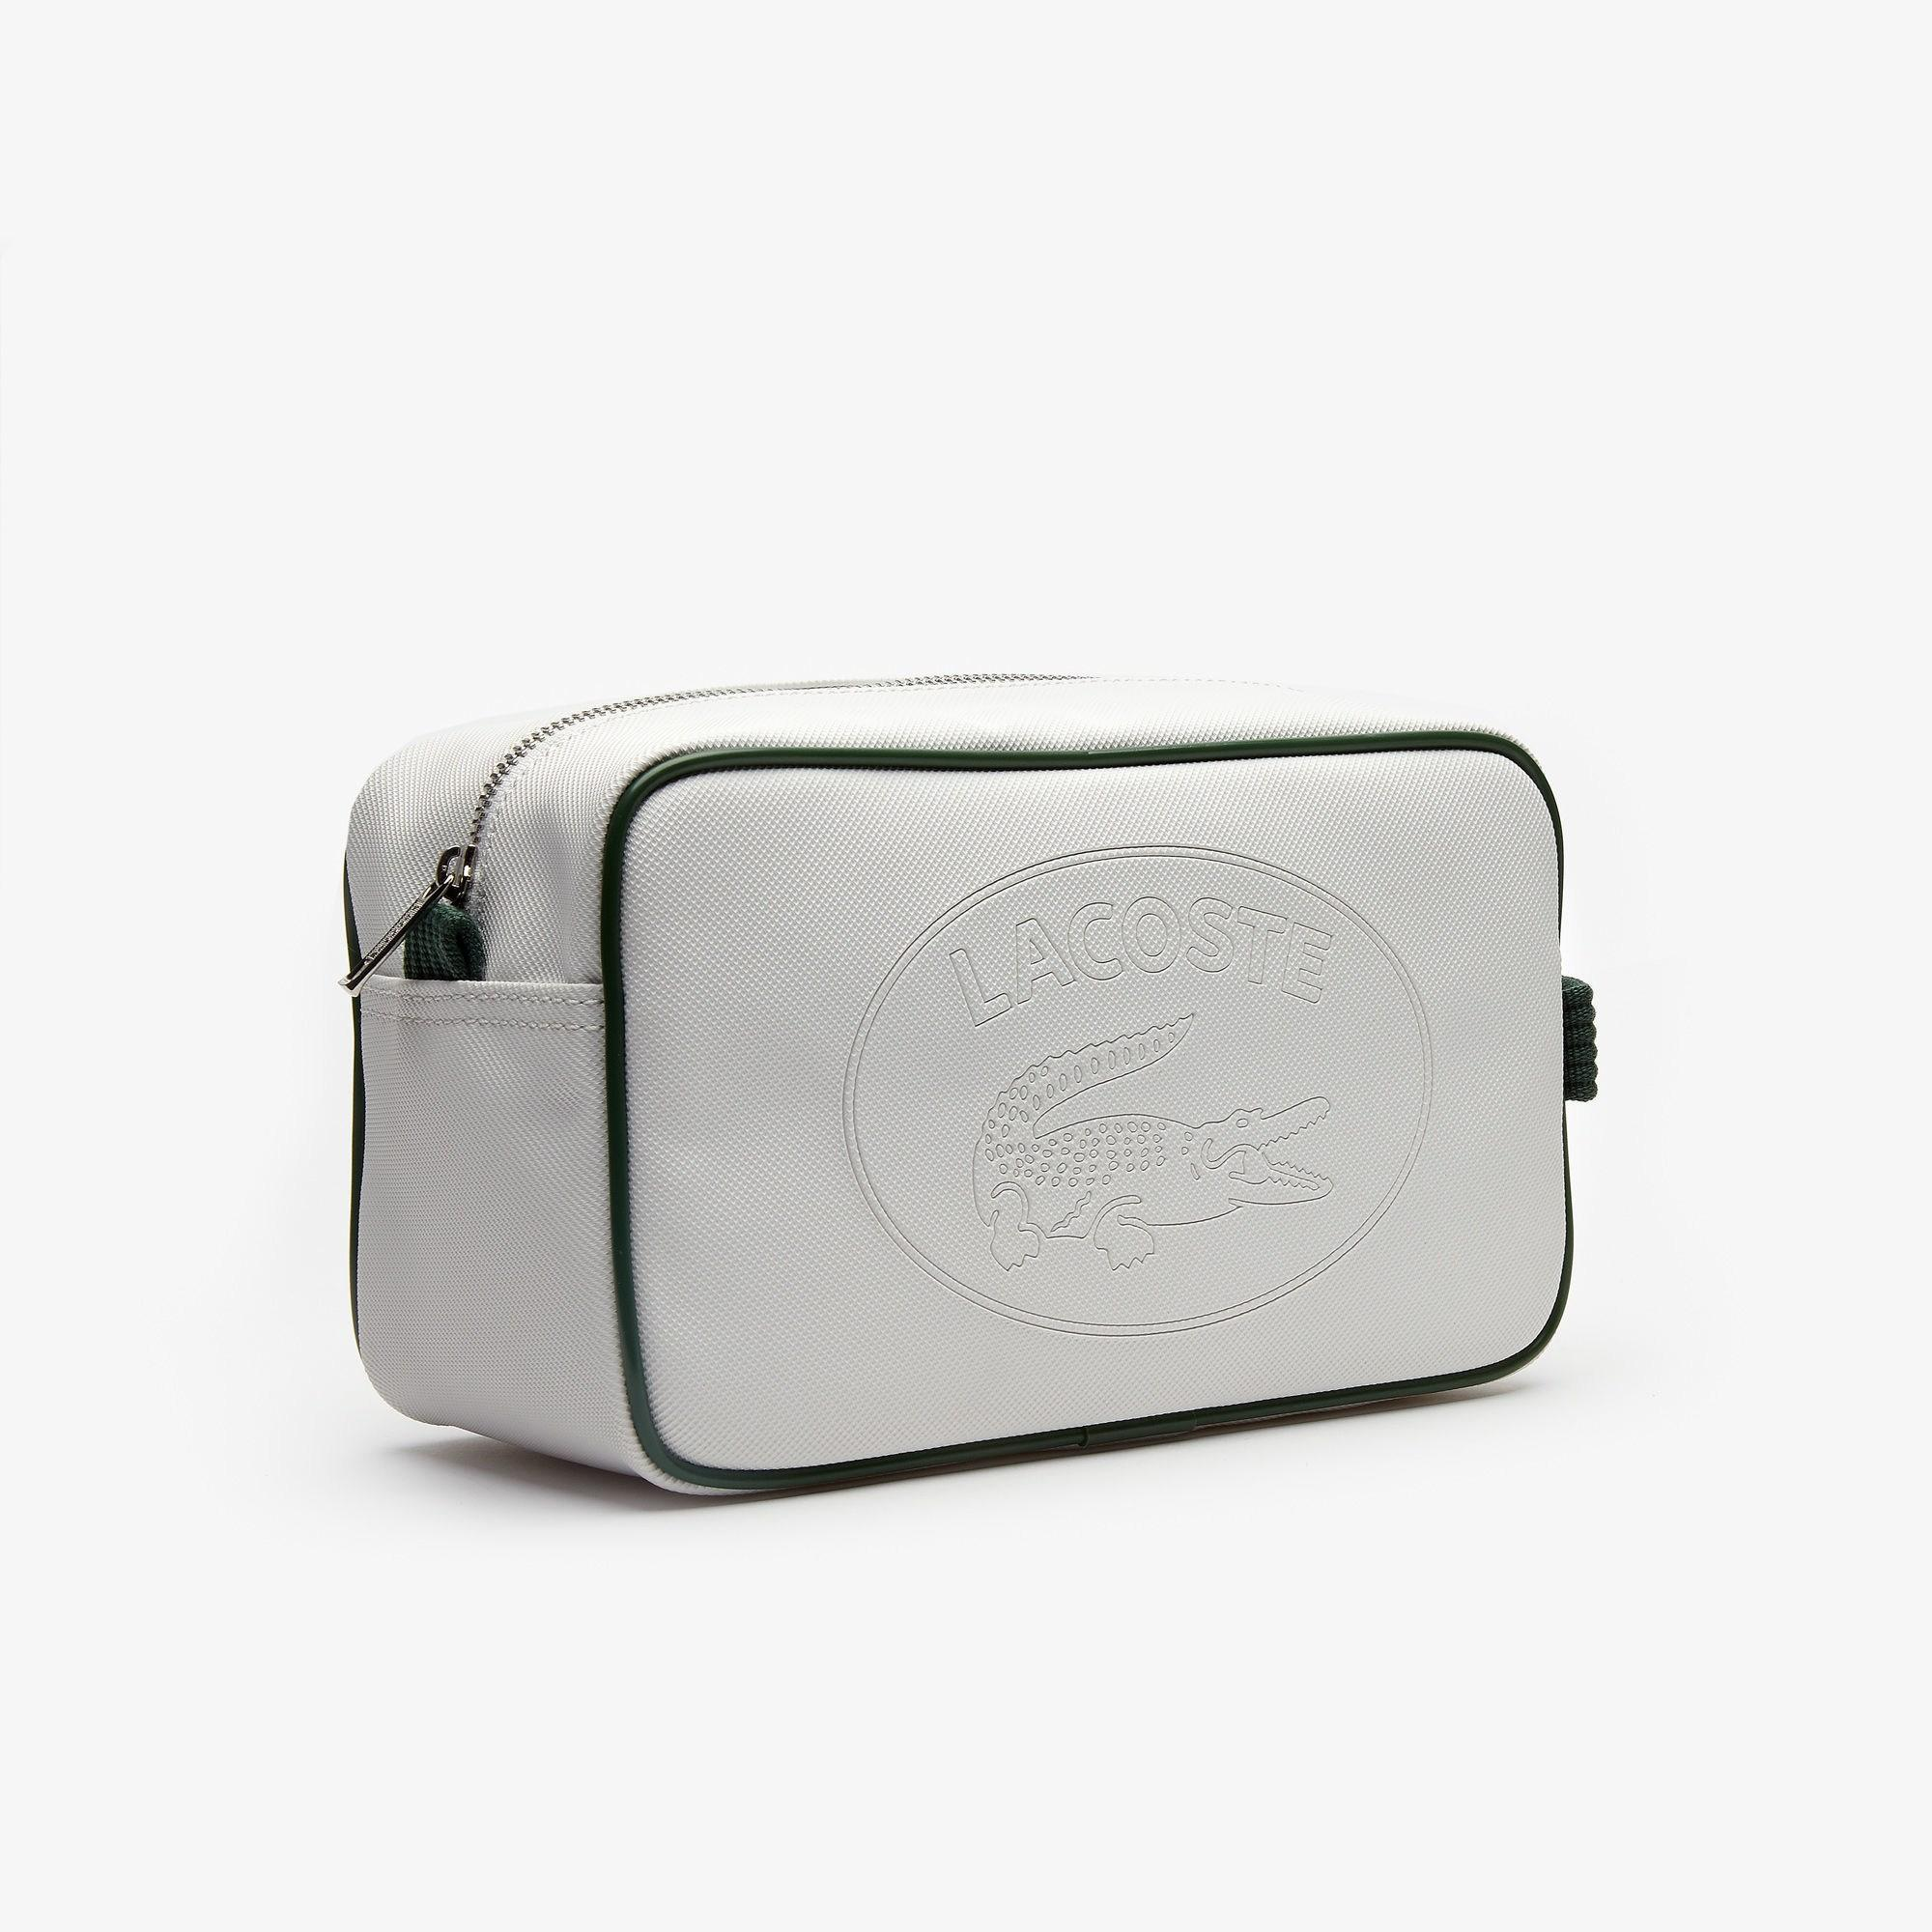 88925a8b1f9 Lacoste - White 1930's Original Embossed Lettering Toiletry Kit for Men -  Lyst. View fullscreen